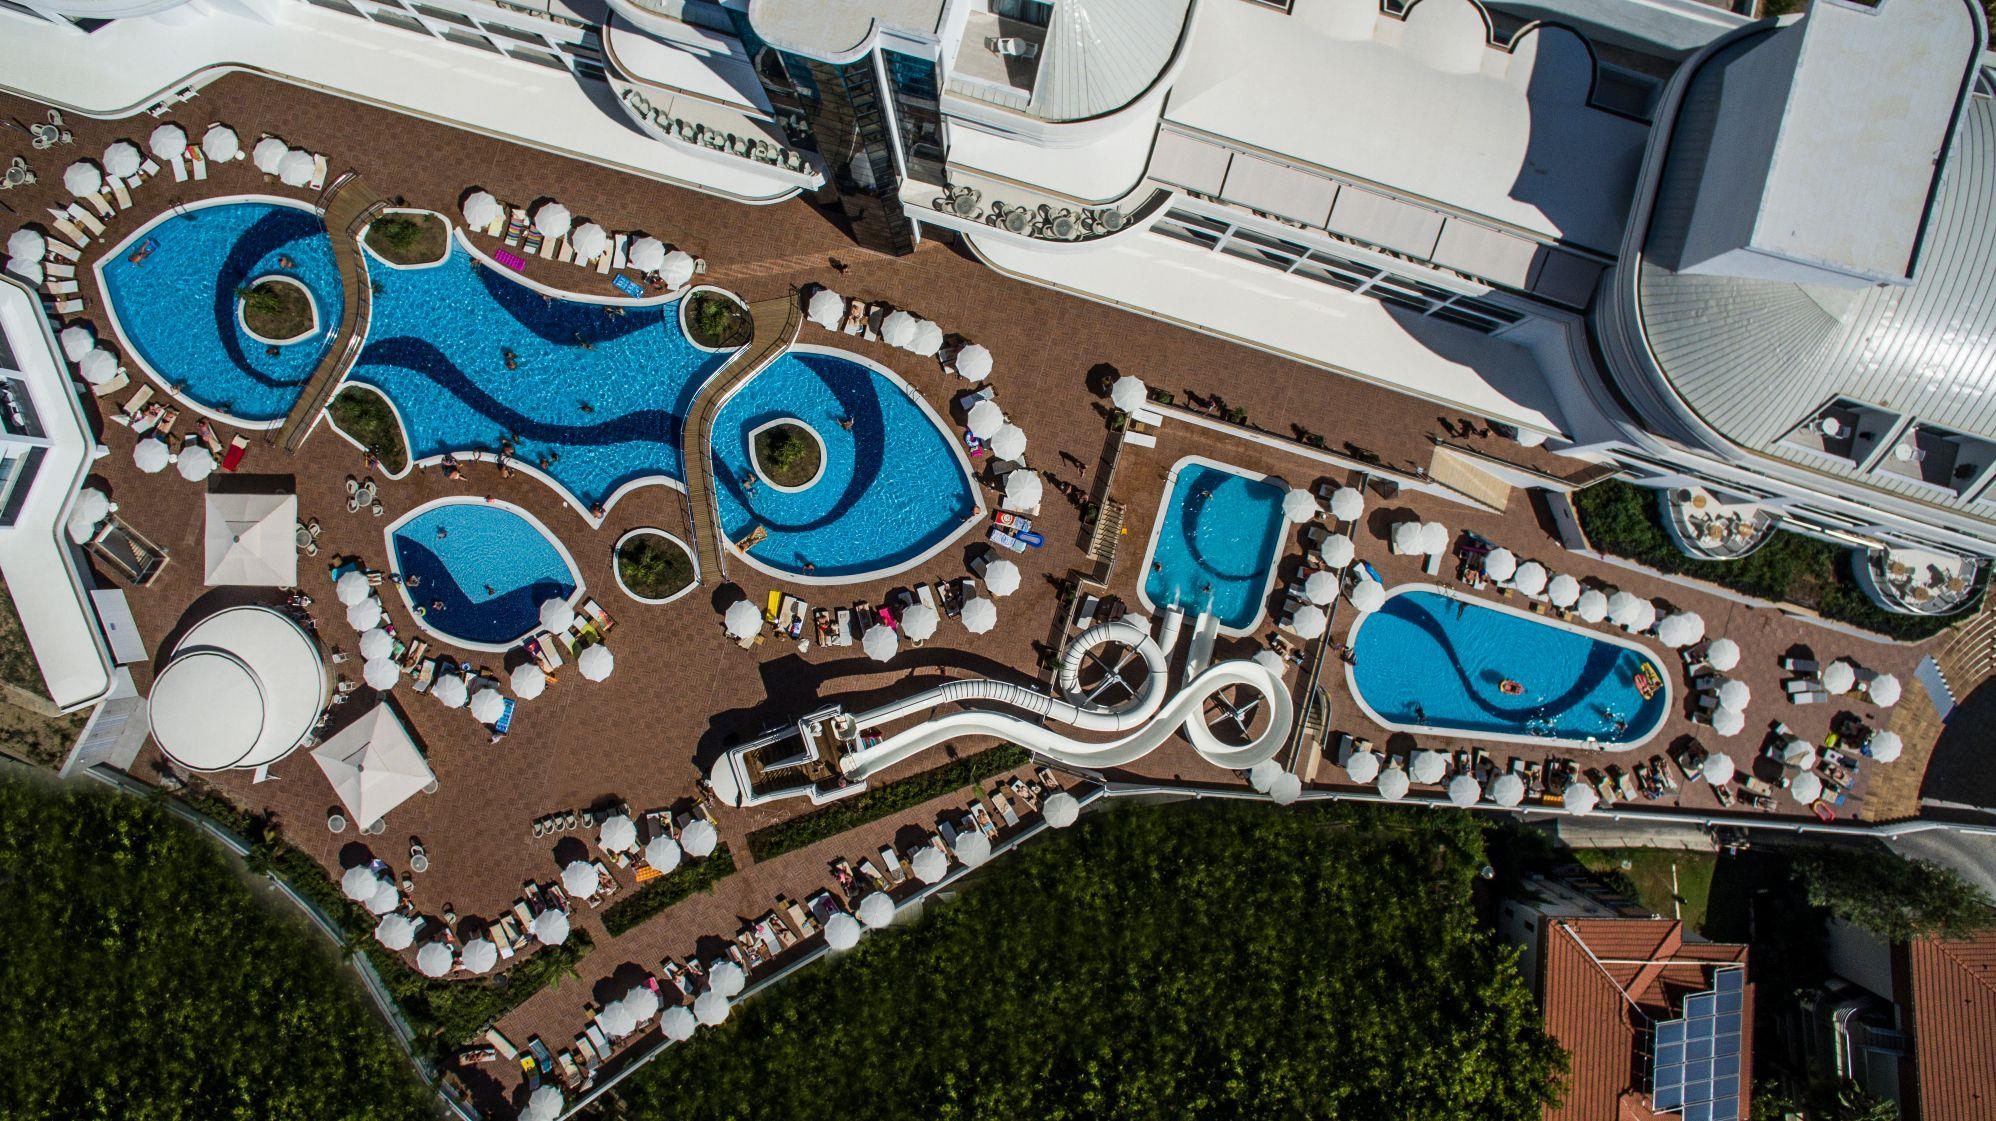 http://www.orextravel.sk/OREX/hotelphotos/laguna-beach-alya-general-0011.jpg